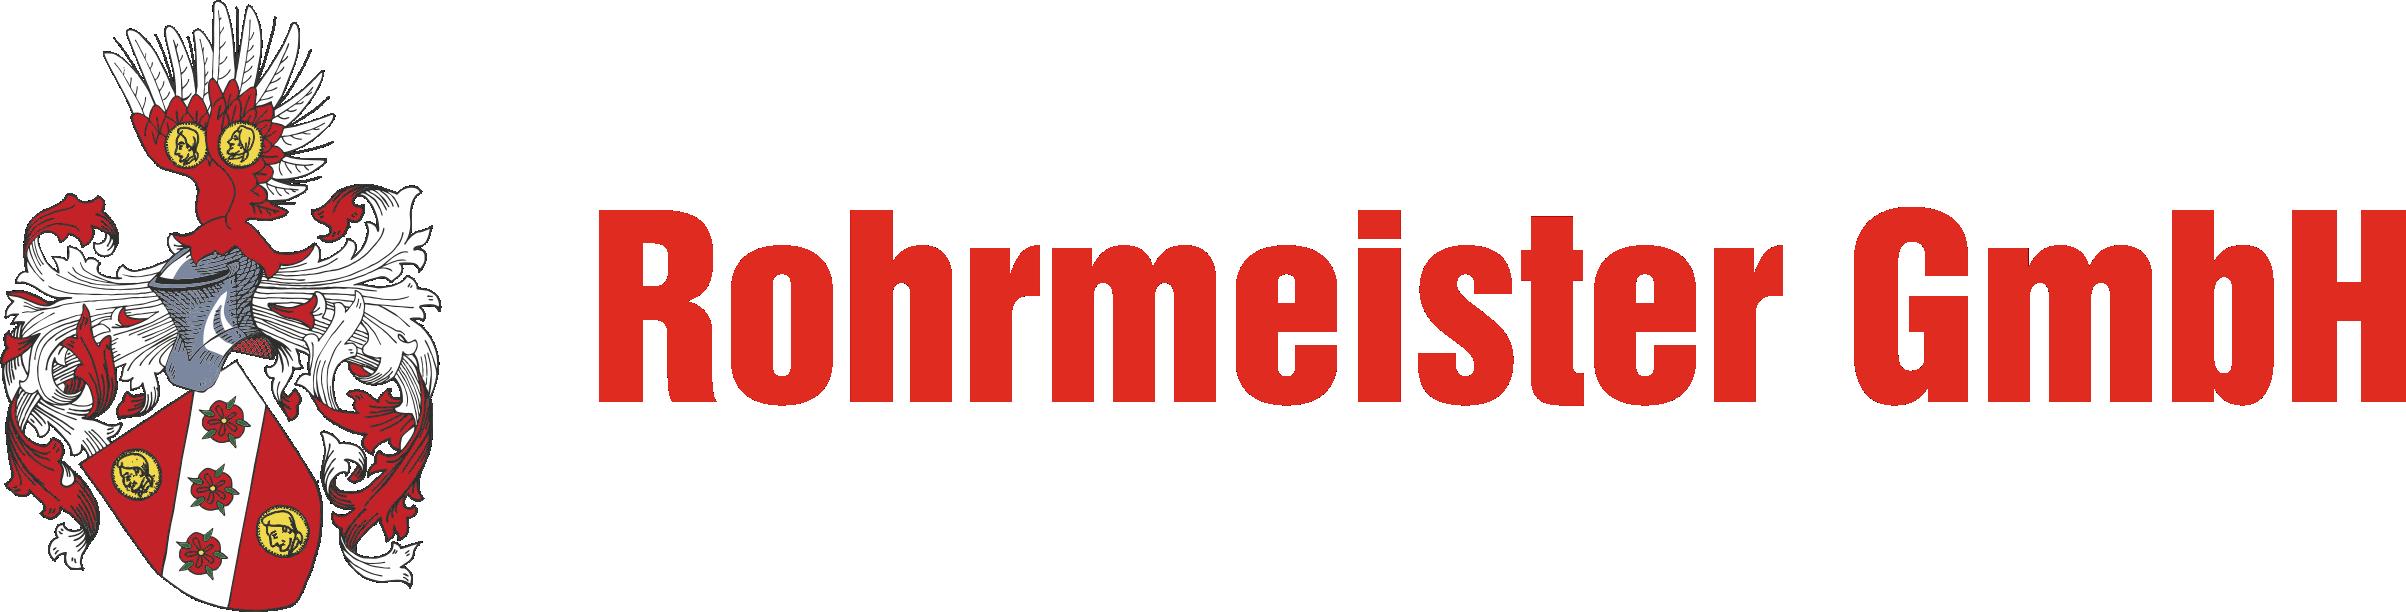 Rohrmeister GmbH